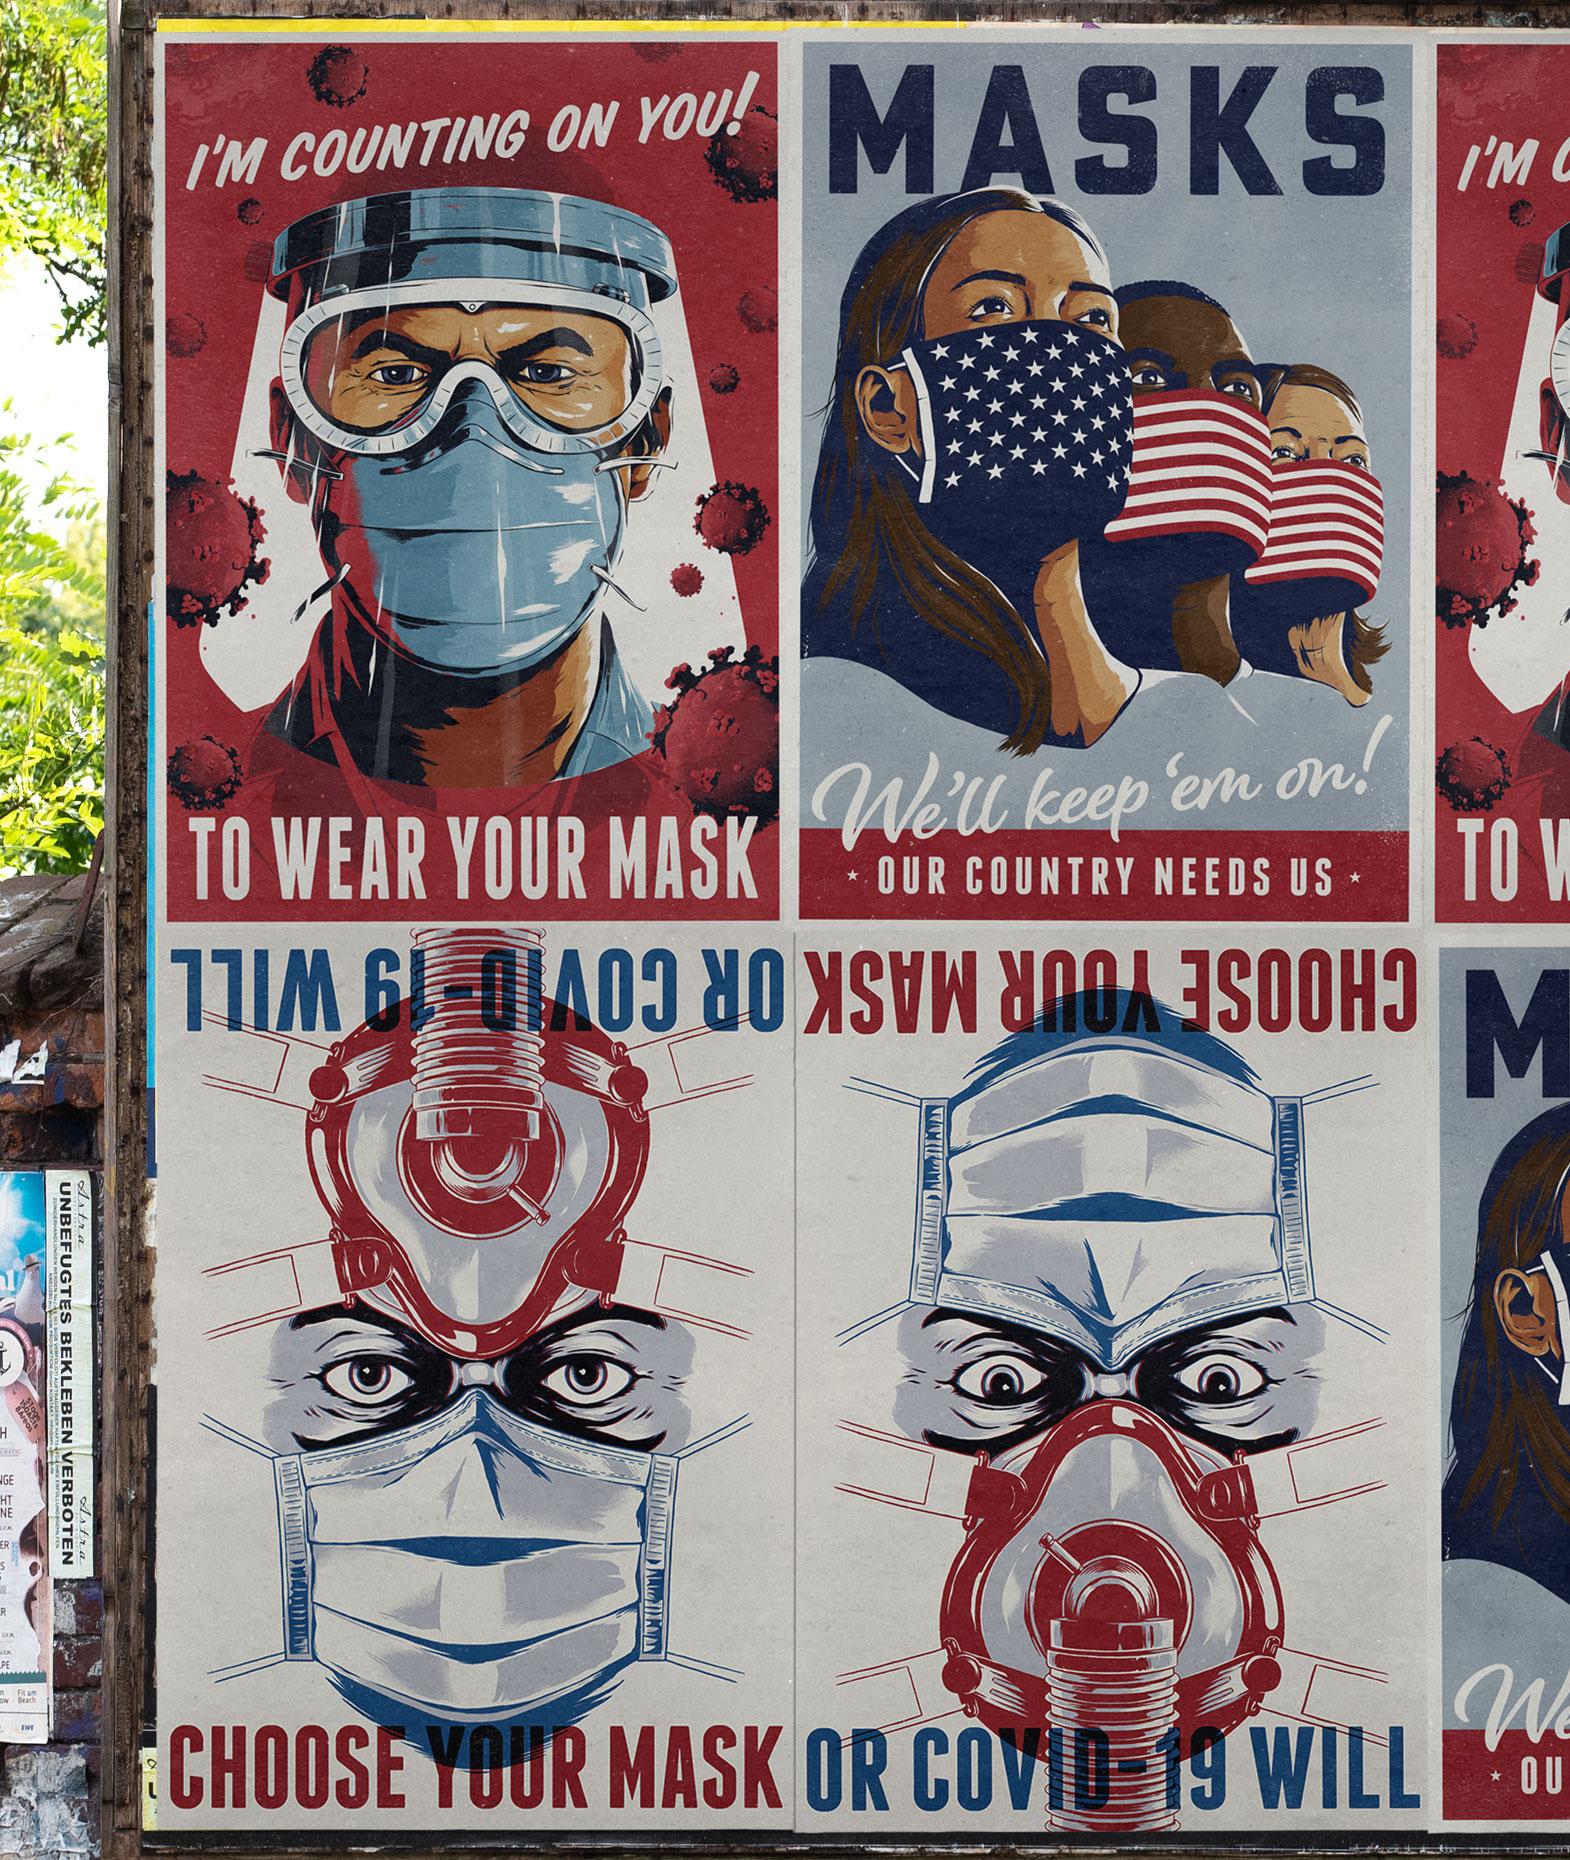 Masks For Freedom